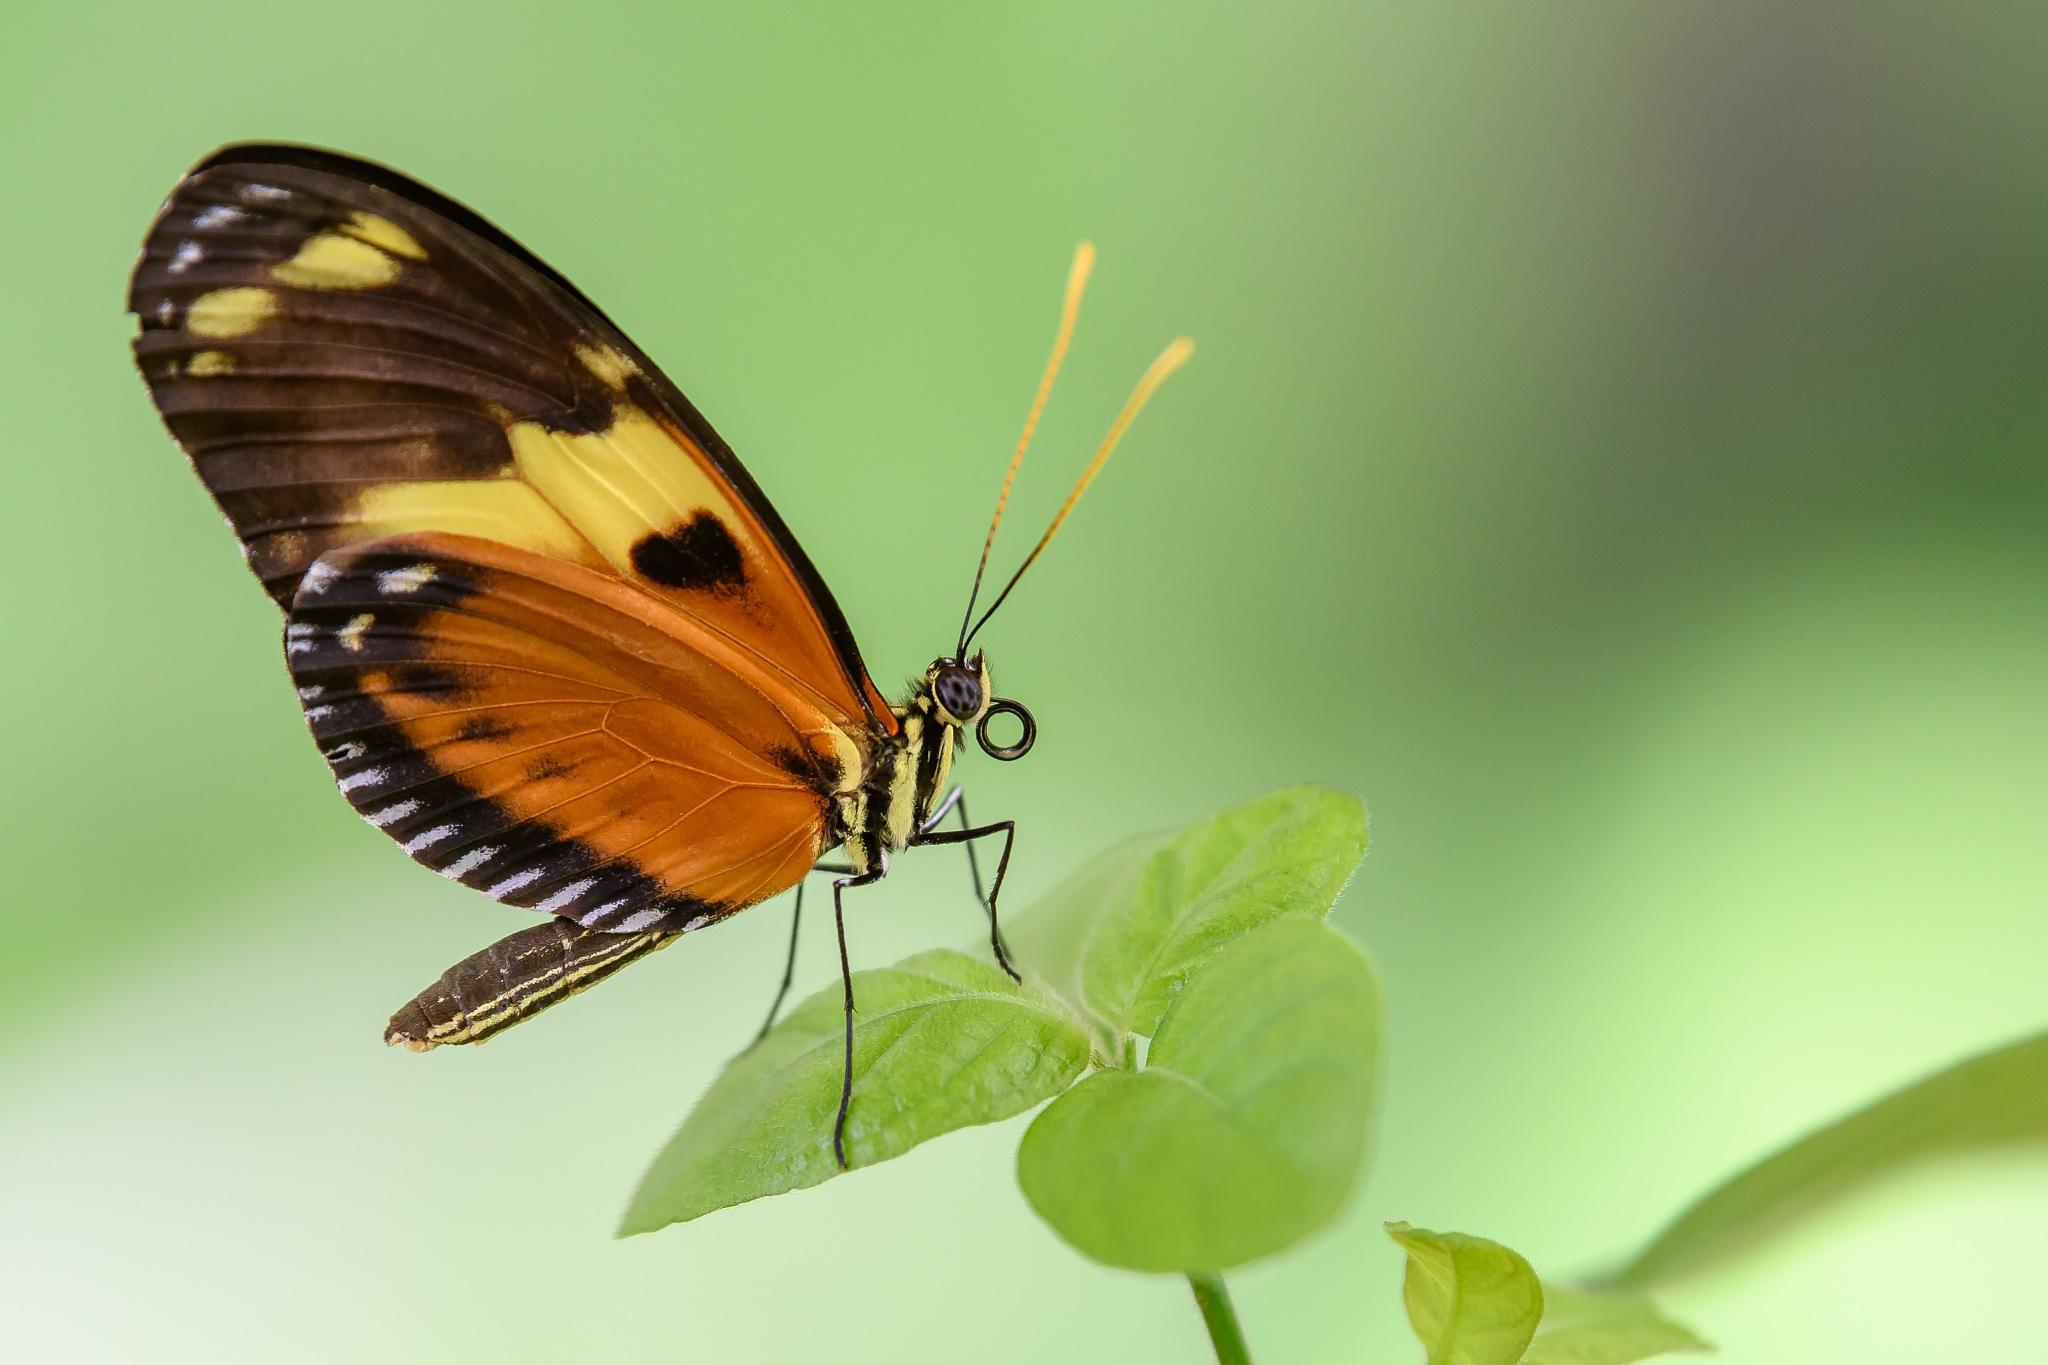 Butterfly 2 by Steve Aicinena